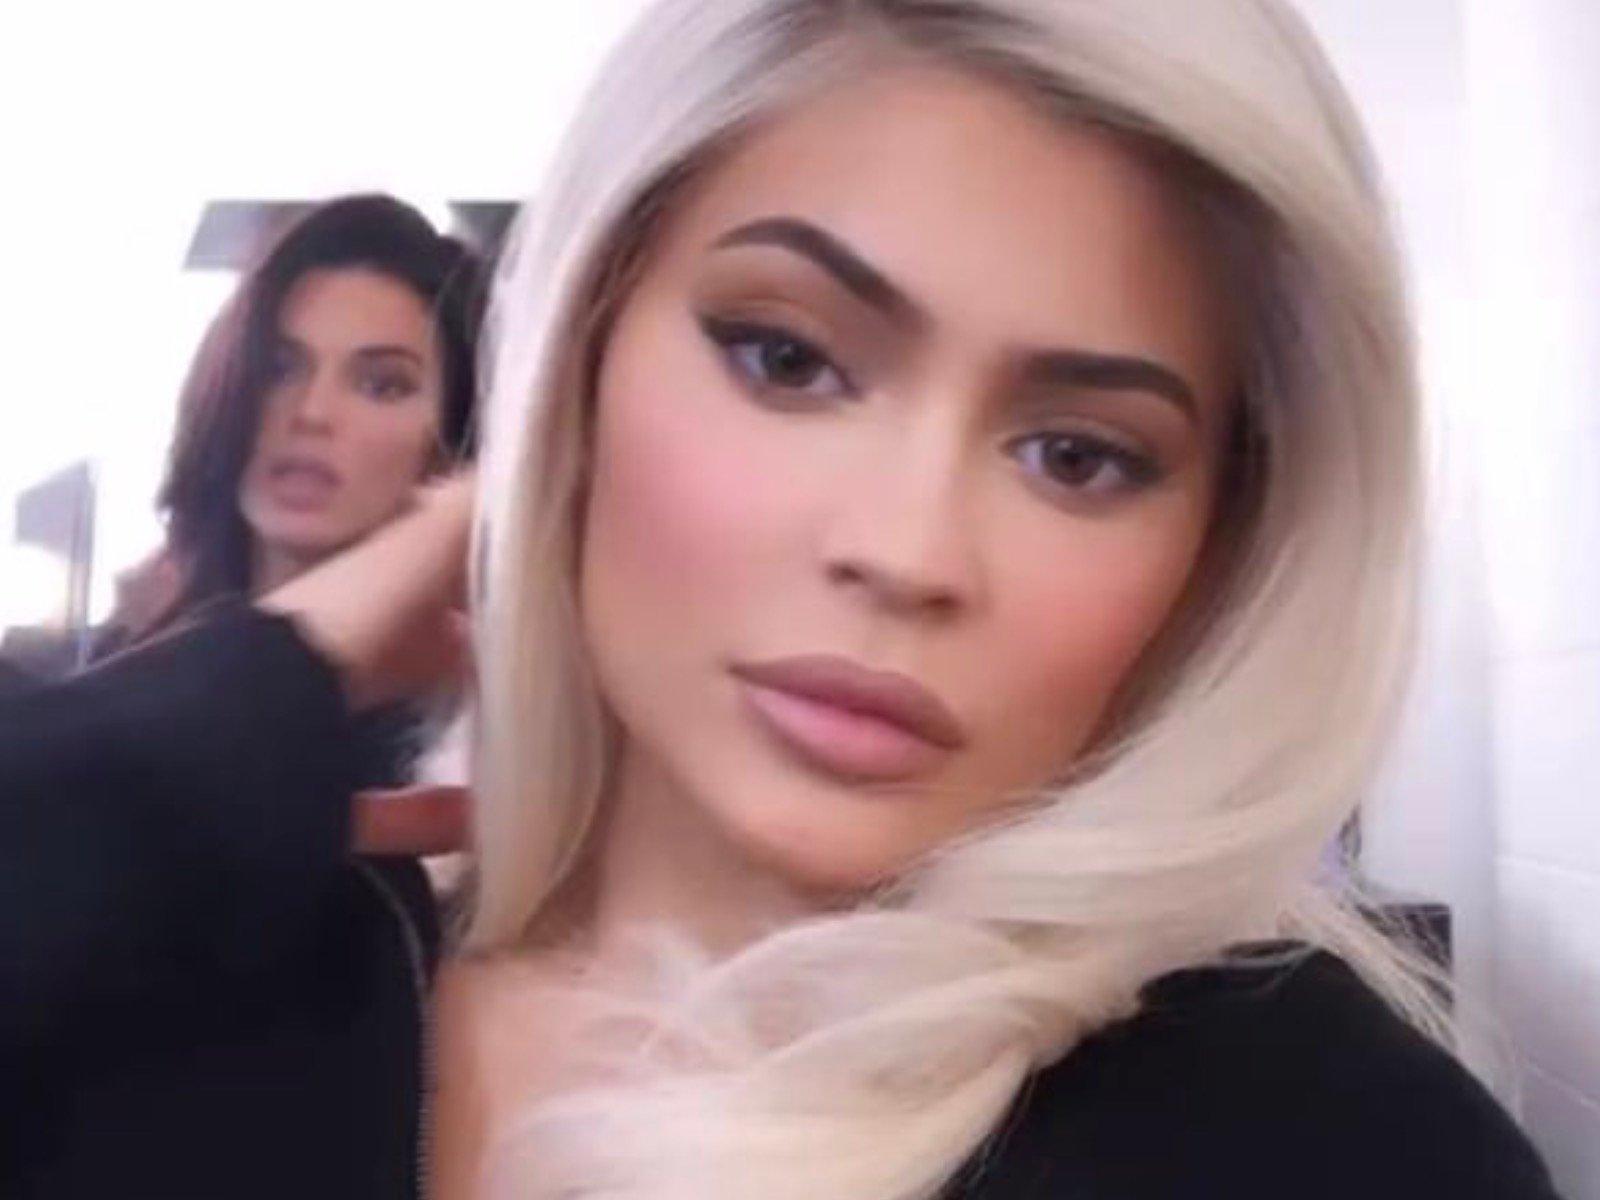 Kendall Jenner Kylie Jenner Video